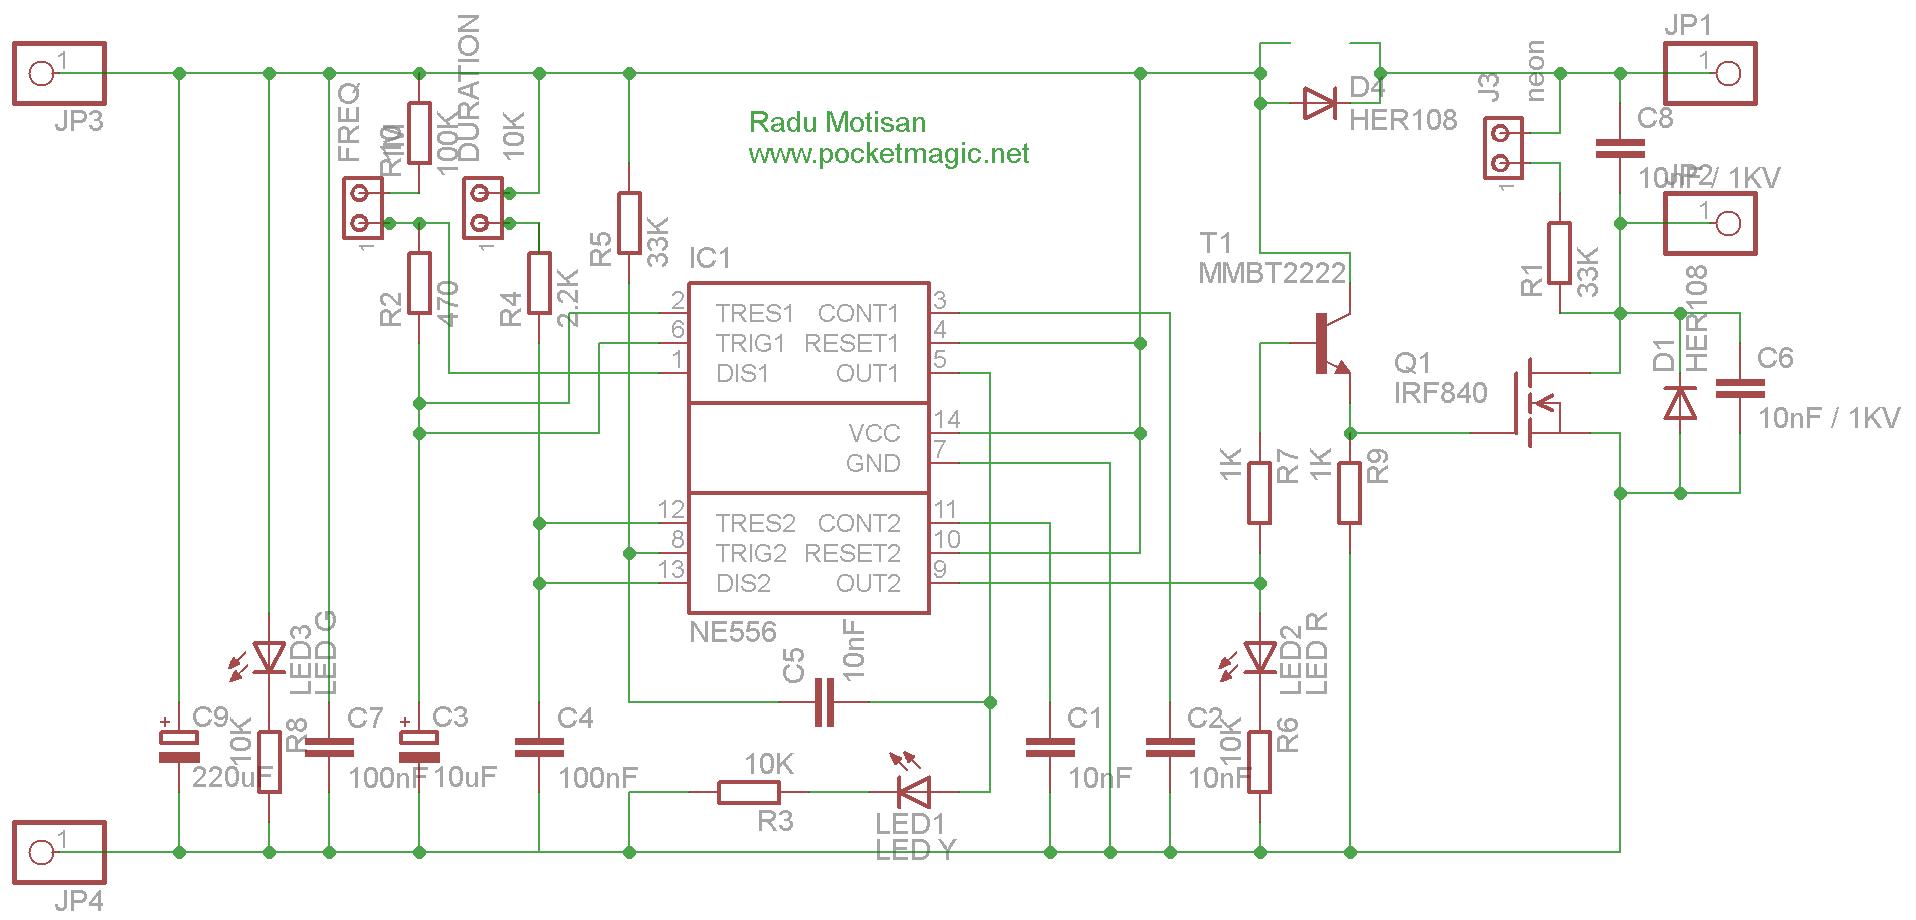 [DIAGRAM_09CH]  BR_2496] Electric Fence Control Circuit 5 Controlcircuit Circuit Diagram | Wiring Diagram Hot Wire Fence |  | Epsy Unbe Loida Umng Mohammedshrine Librar Wiring 101